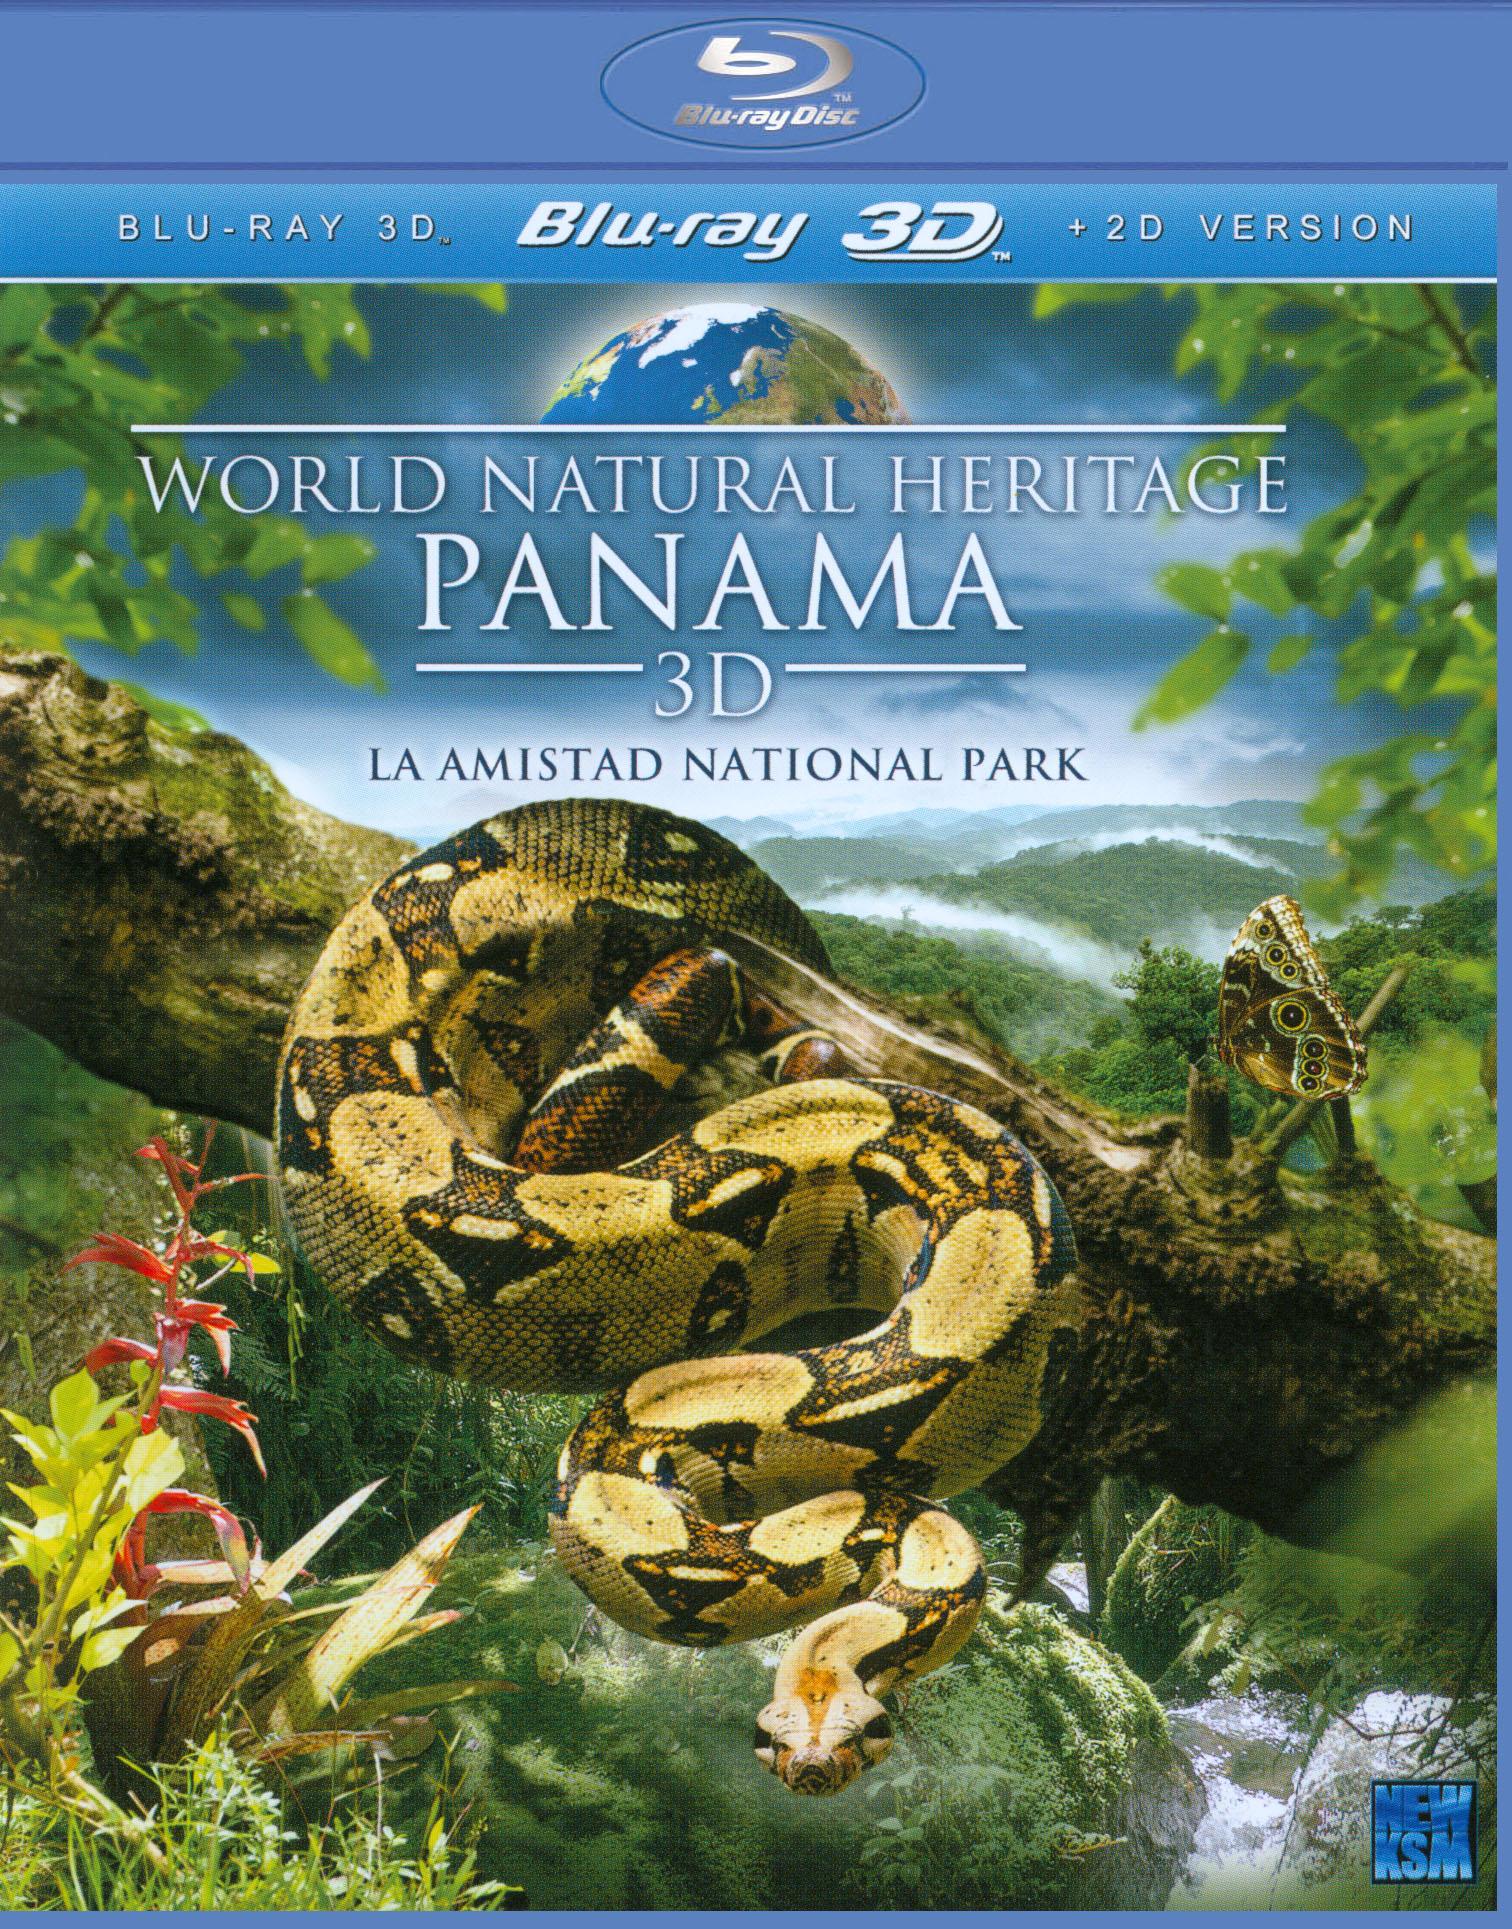 World Natural Heritage: Panama 3D - La Amistad National Park